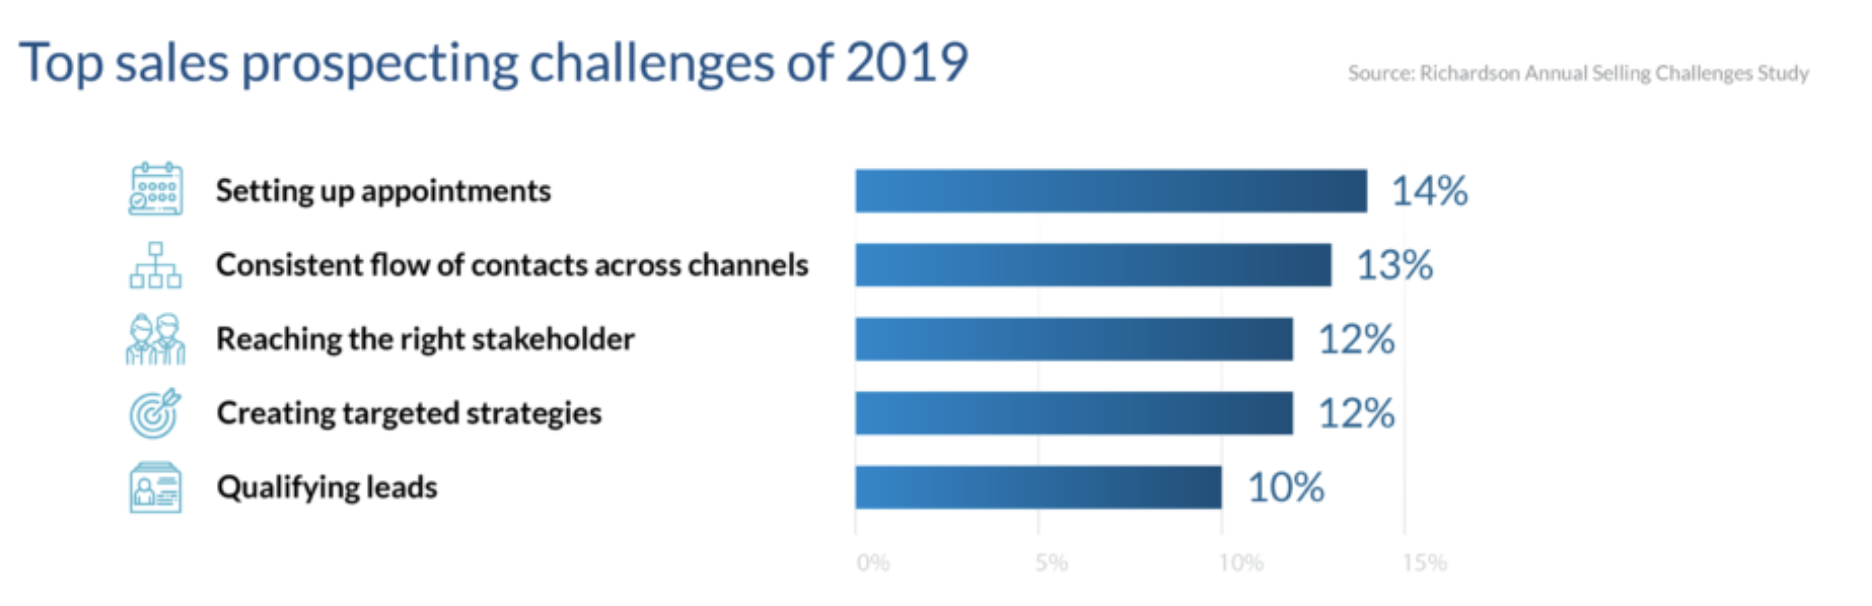 Top sales prospecting challenges of 2019